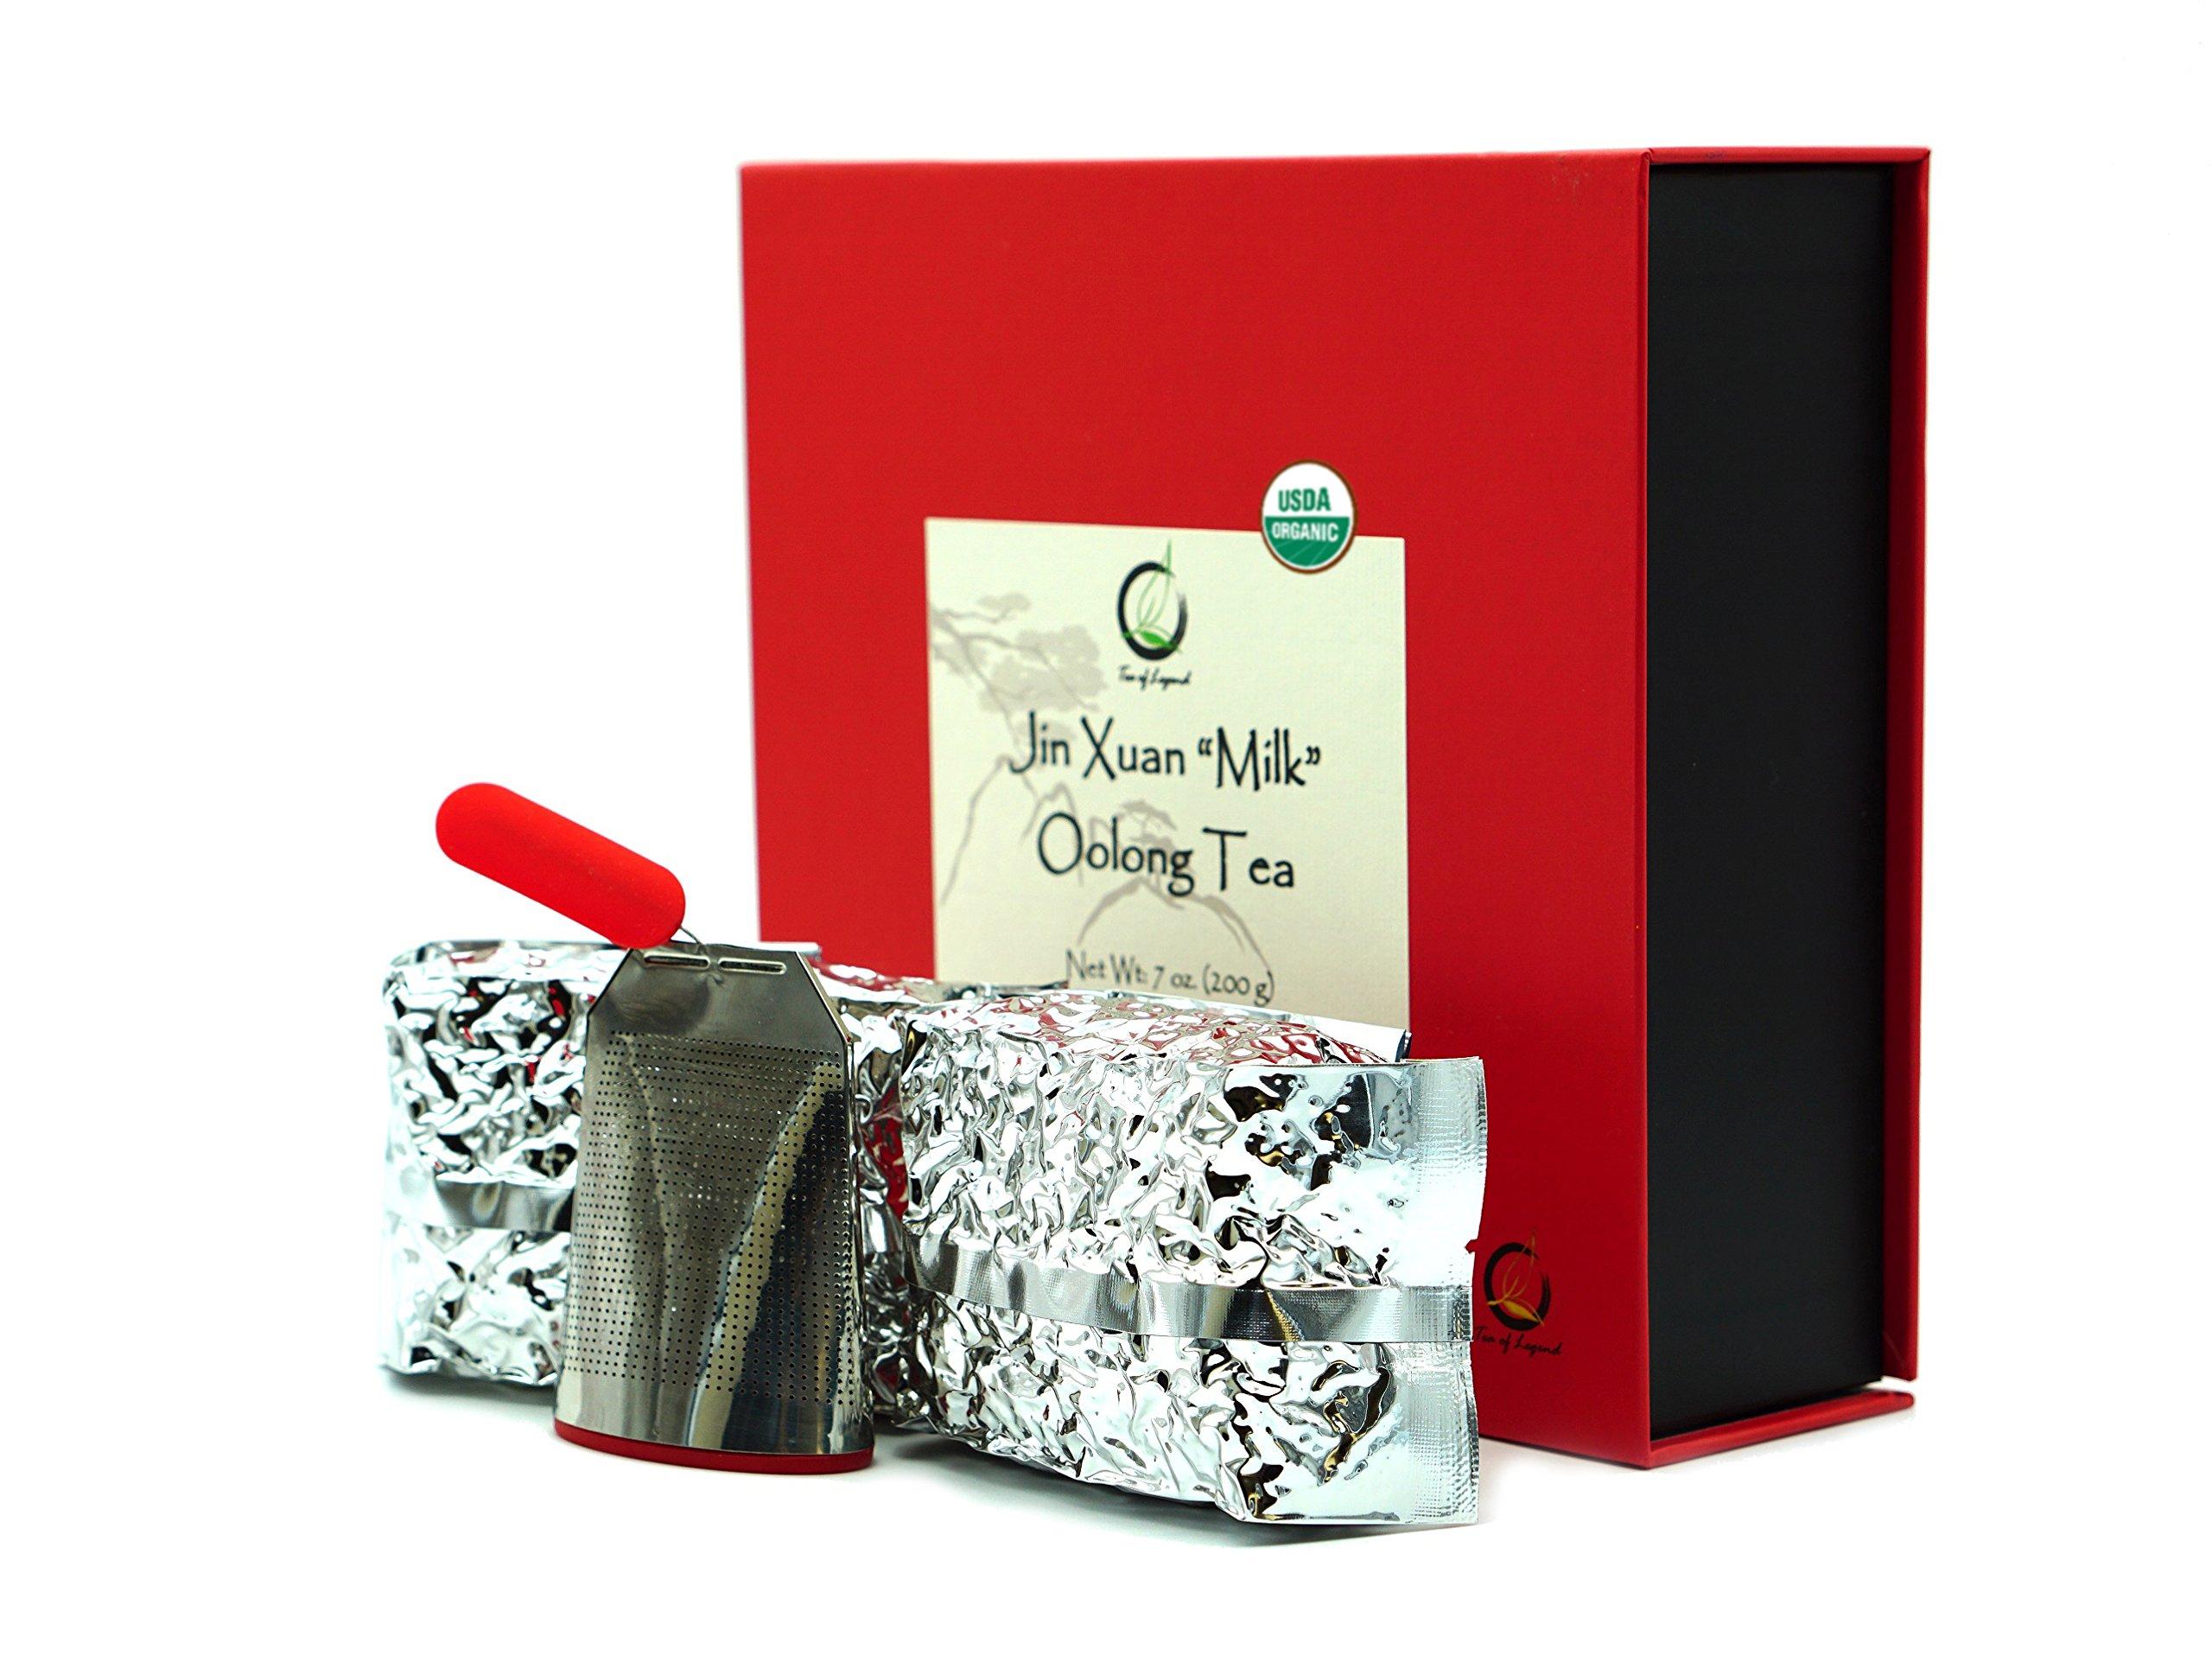 Premium Jin Xuan Milk Oolong Tea Gift Set